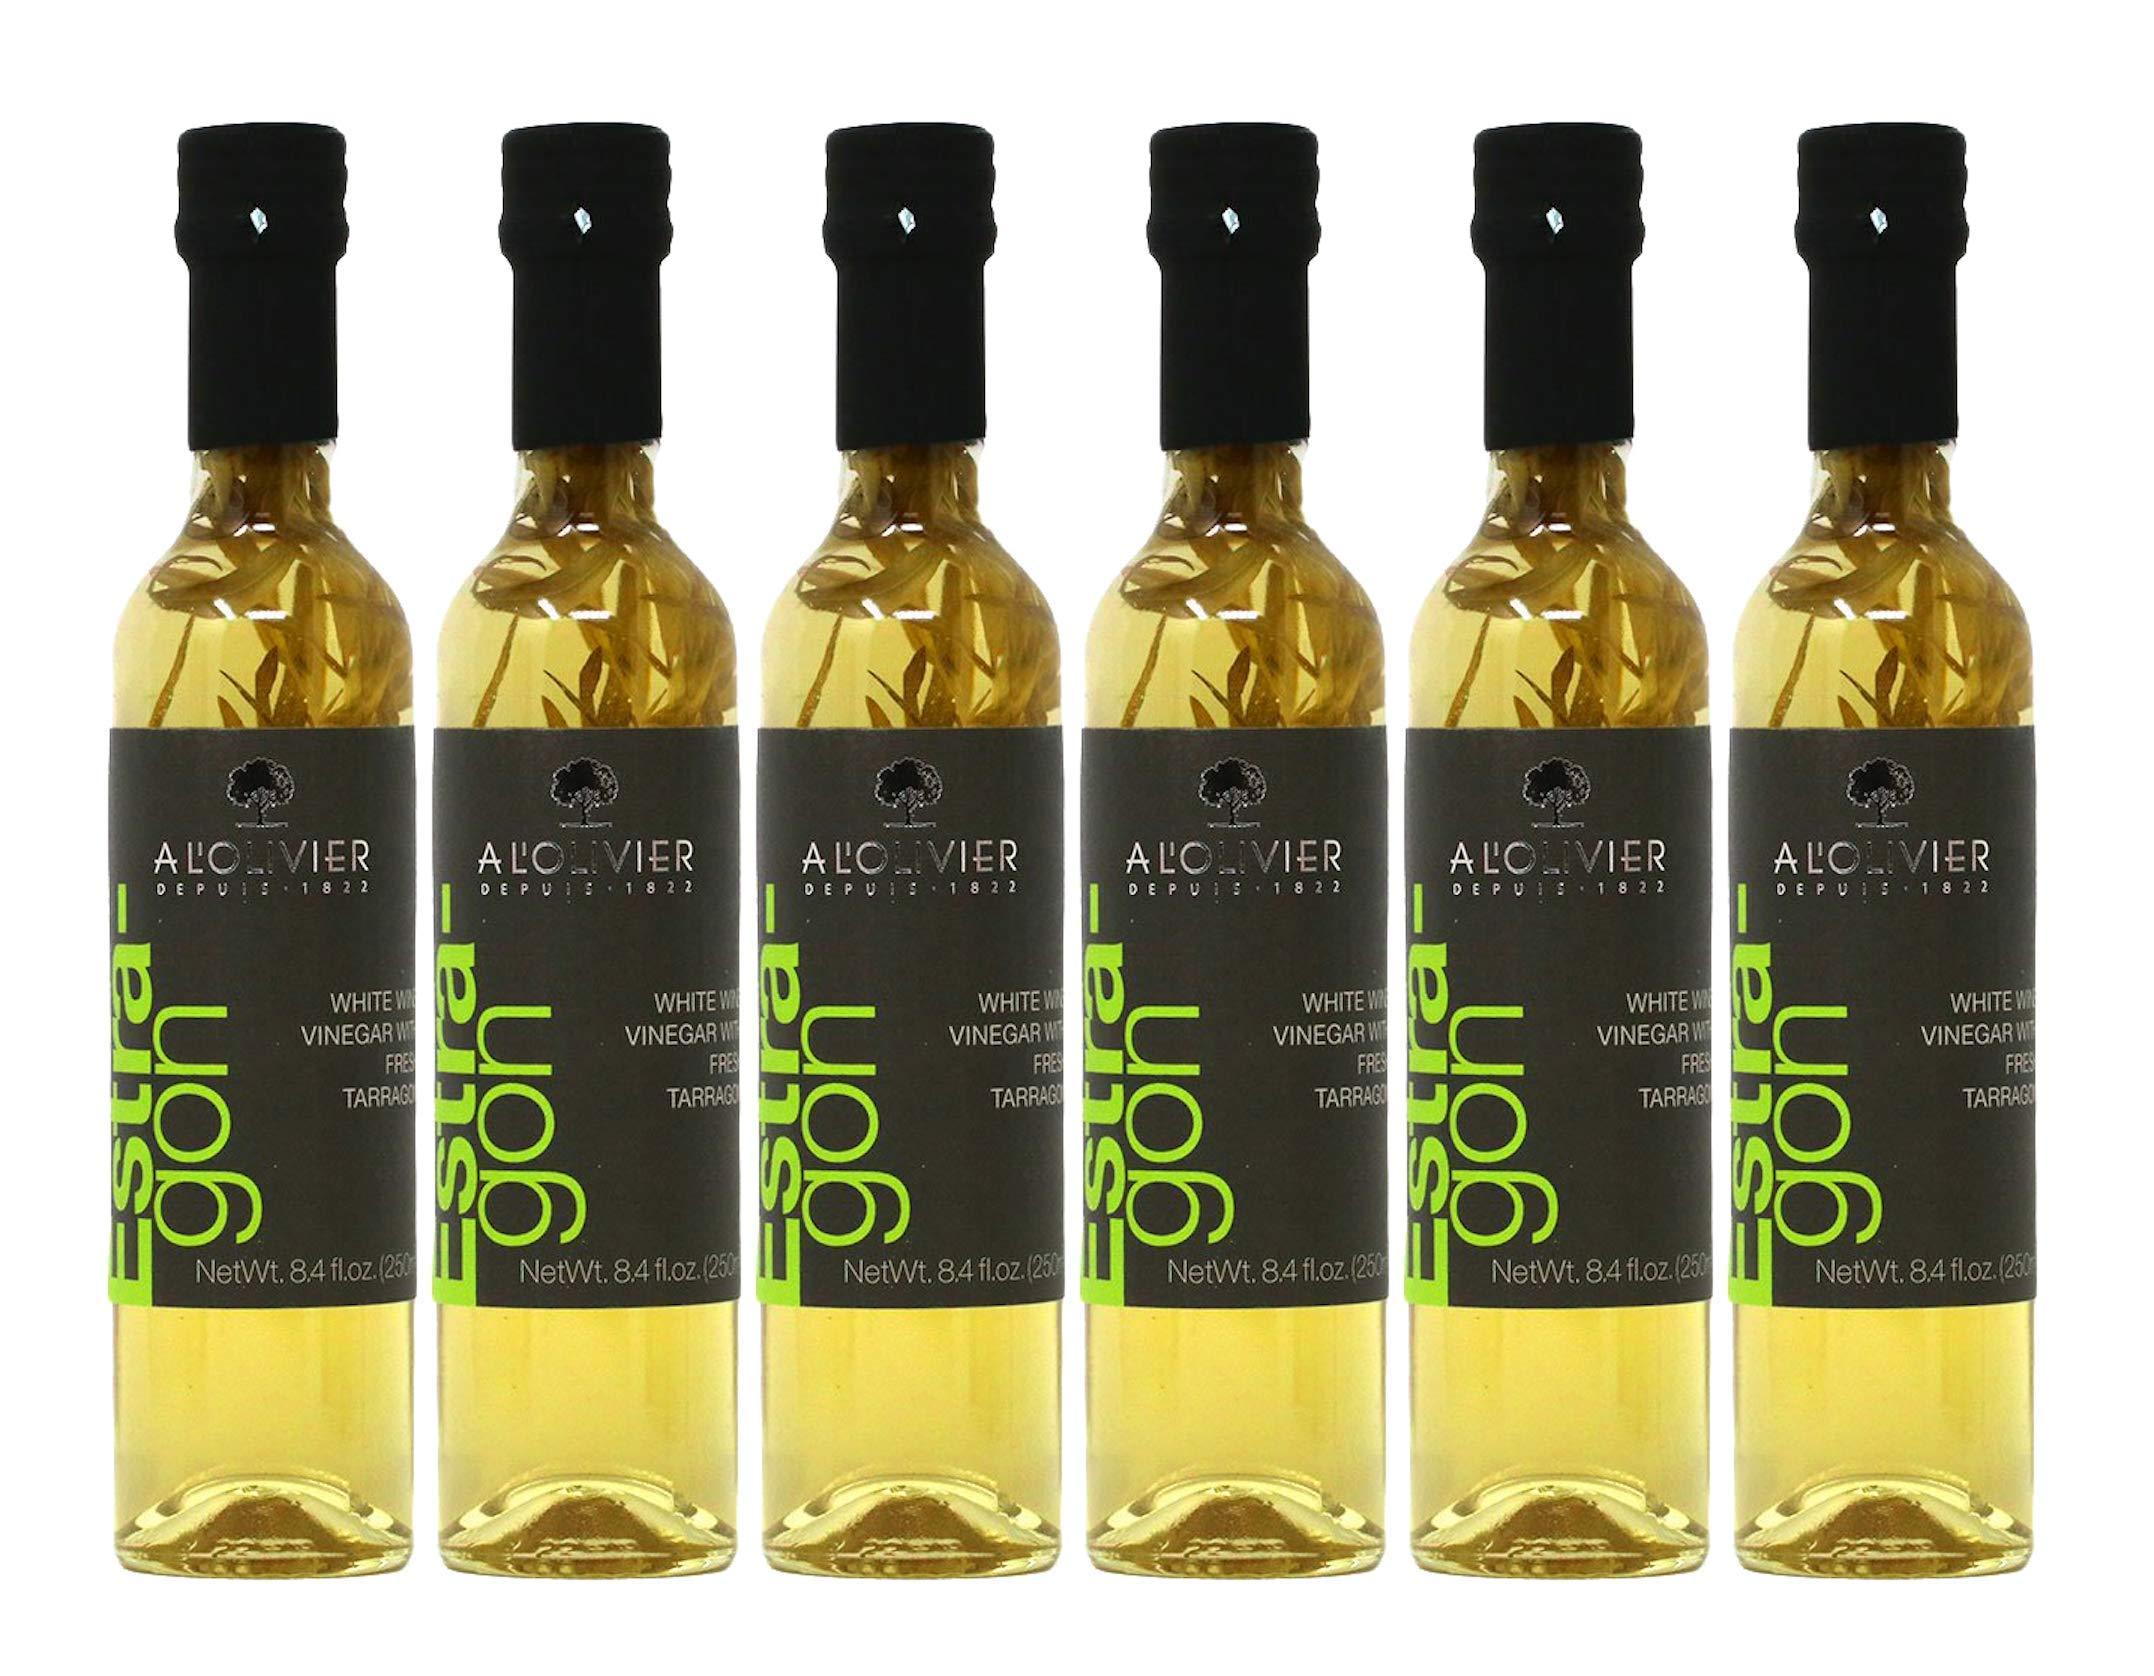 A L'Olivier Vinegar, White Wine Tarragon, Imported France - 8.4 Fl Oz | Pack of 6 by A L'Olivier